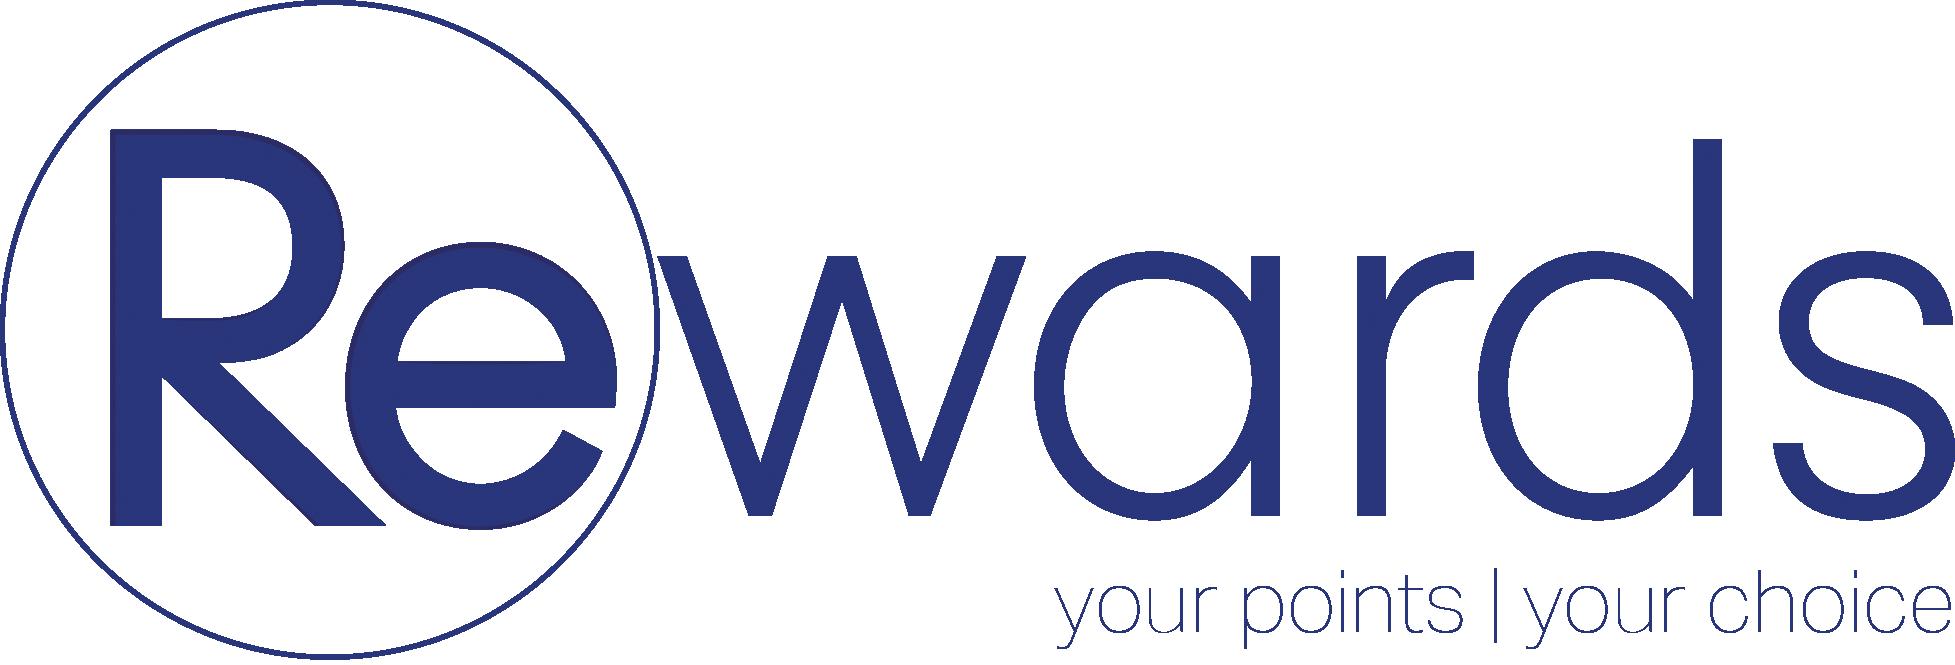 Rewards Logo Blue